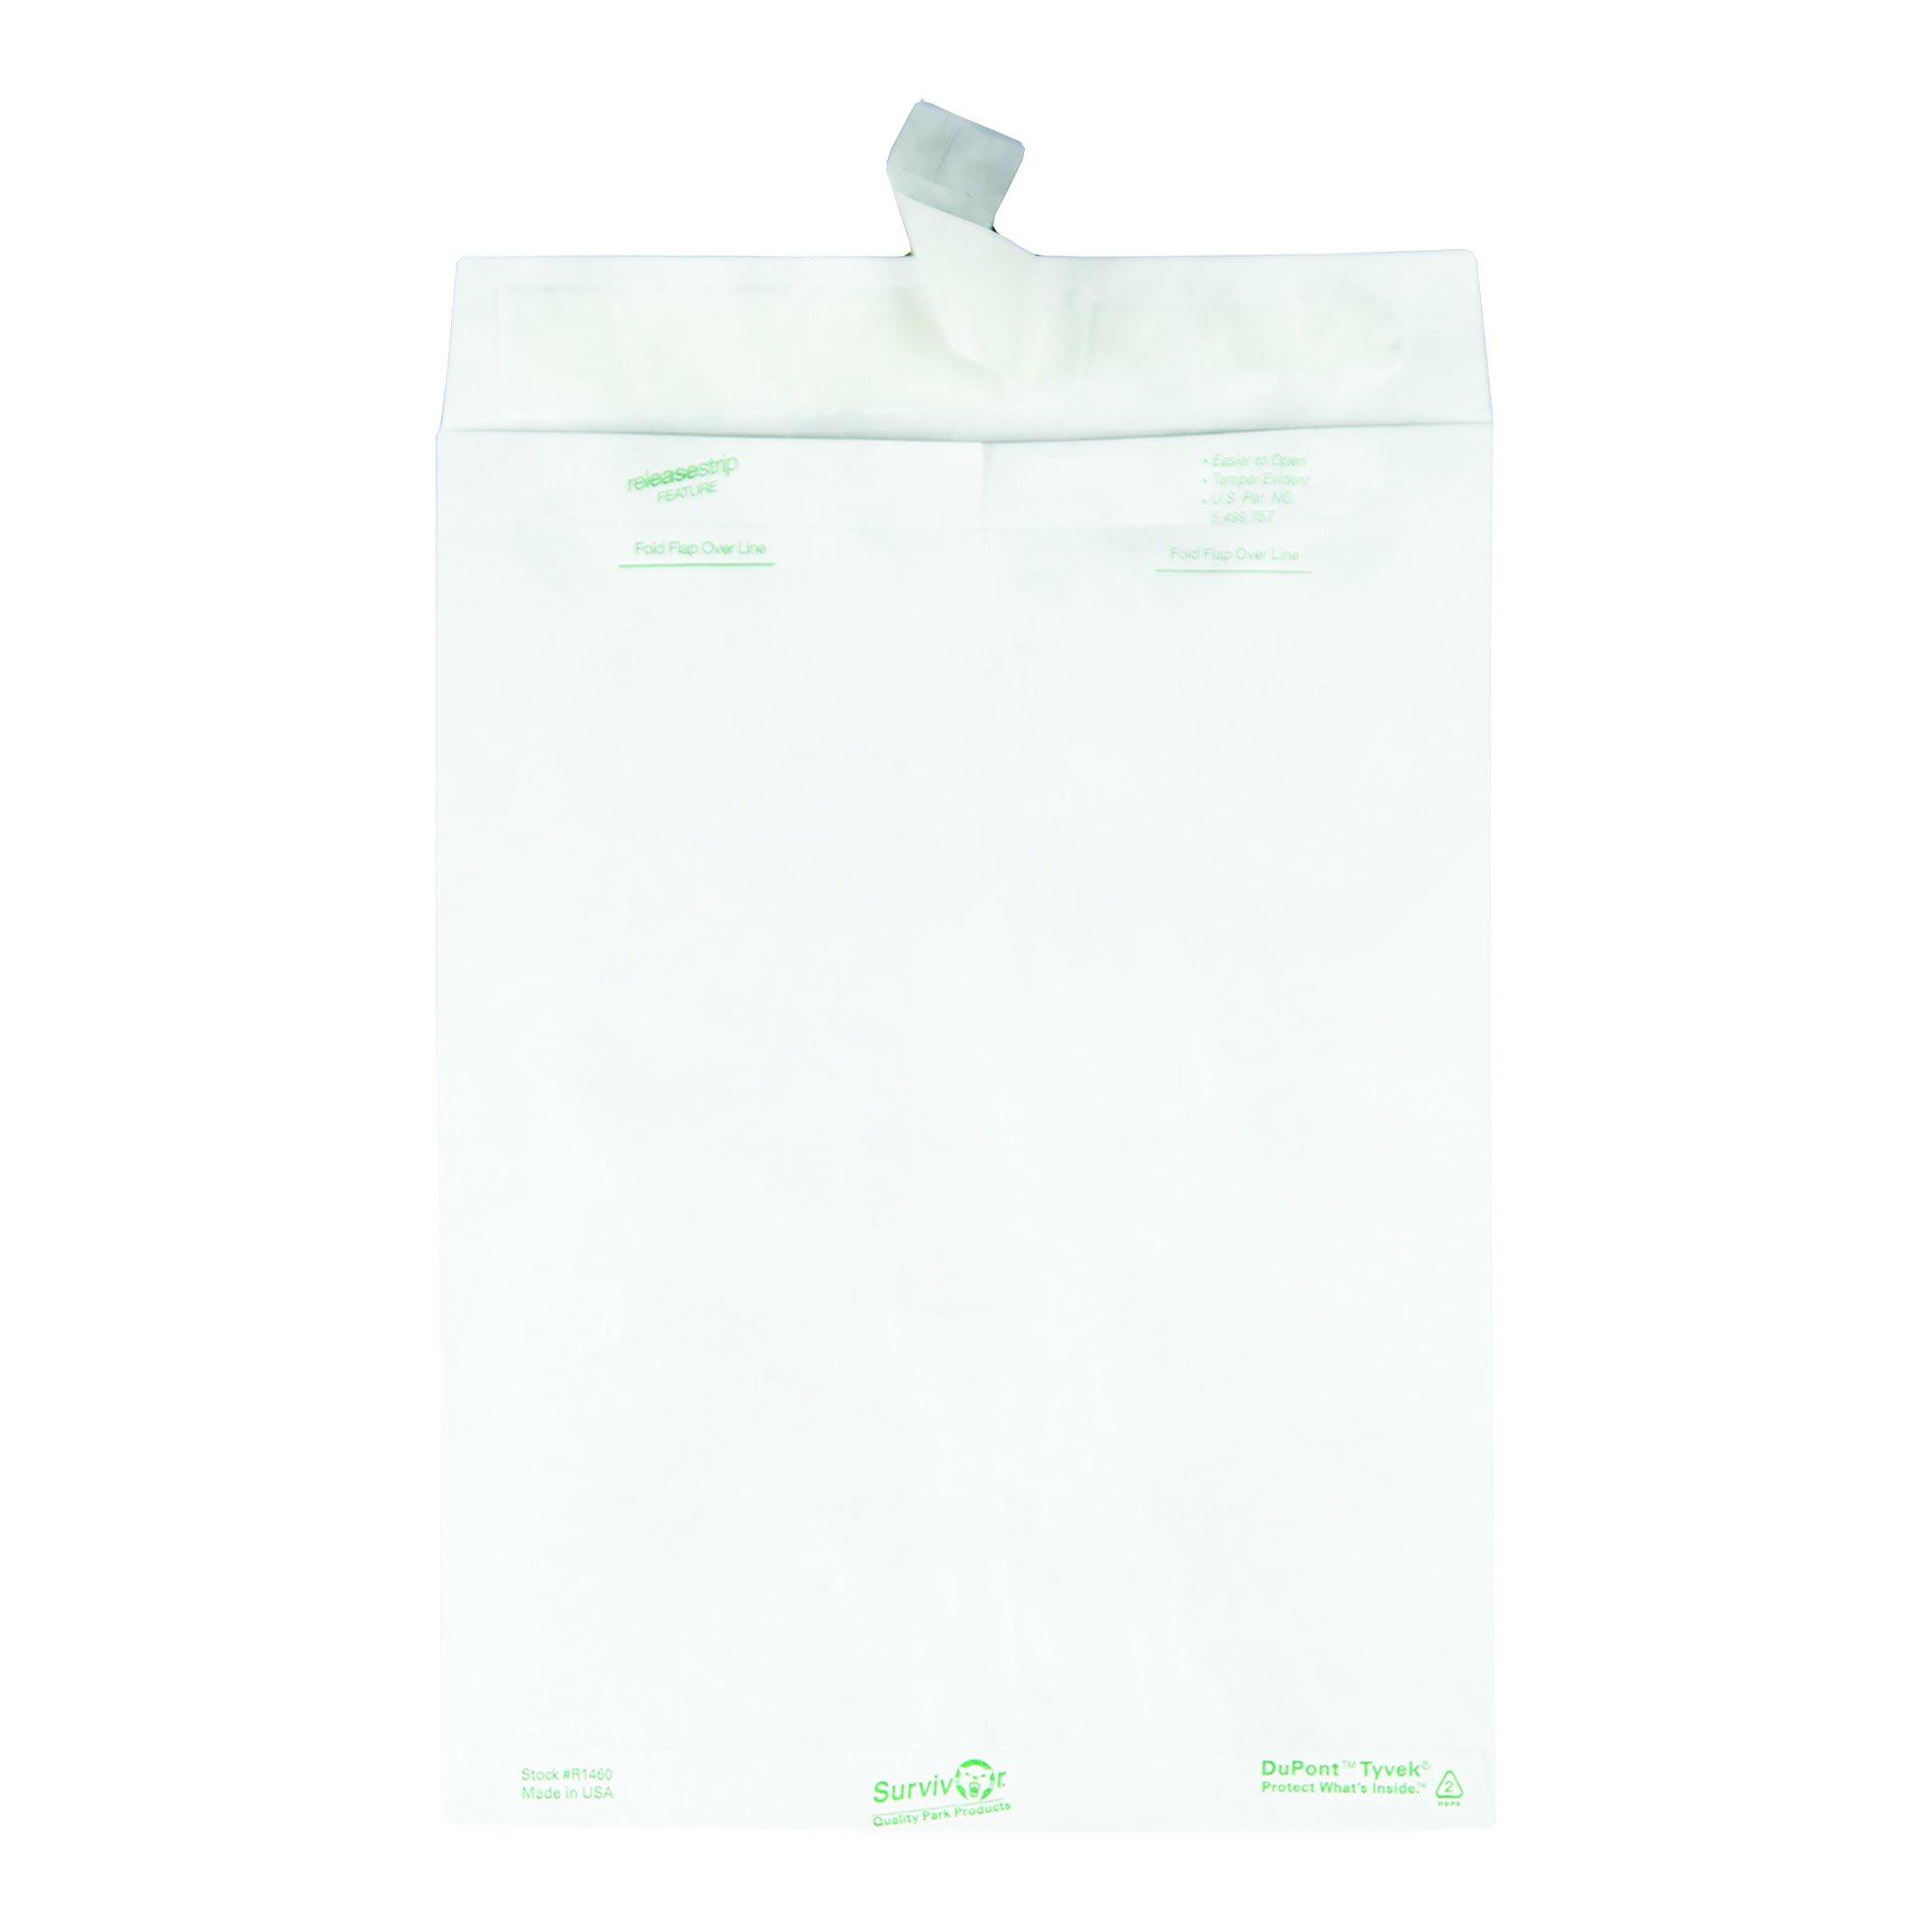 Quality Park Survivor R1460 Tyvek Mailer, 9 x 12, White (Box of 100) by Quality Park (Image #4)